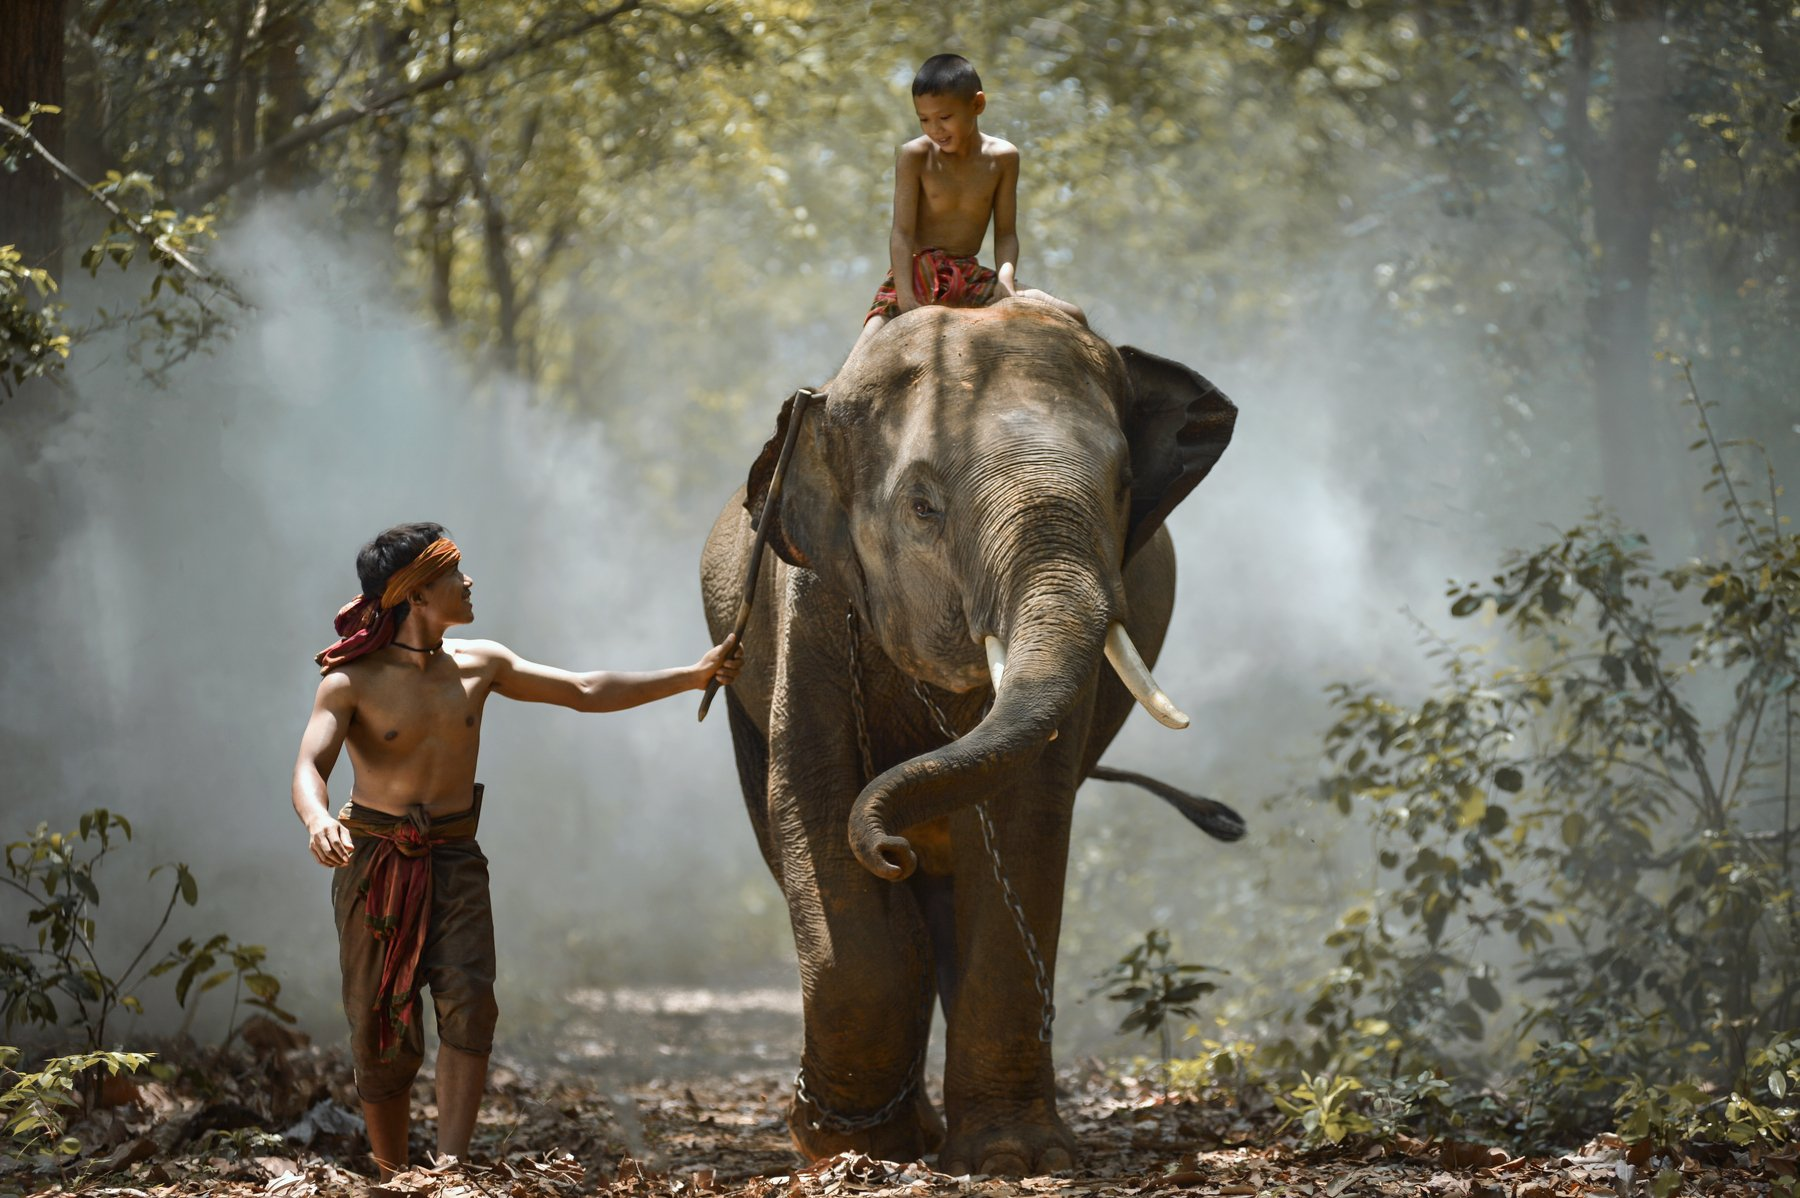 Action, Aec, Africa, Asia, Asian, Bearfoot, Beautiful, Boy, Child, Elephant, Homestay, Man, Saravut Whanset